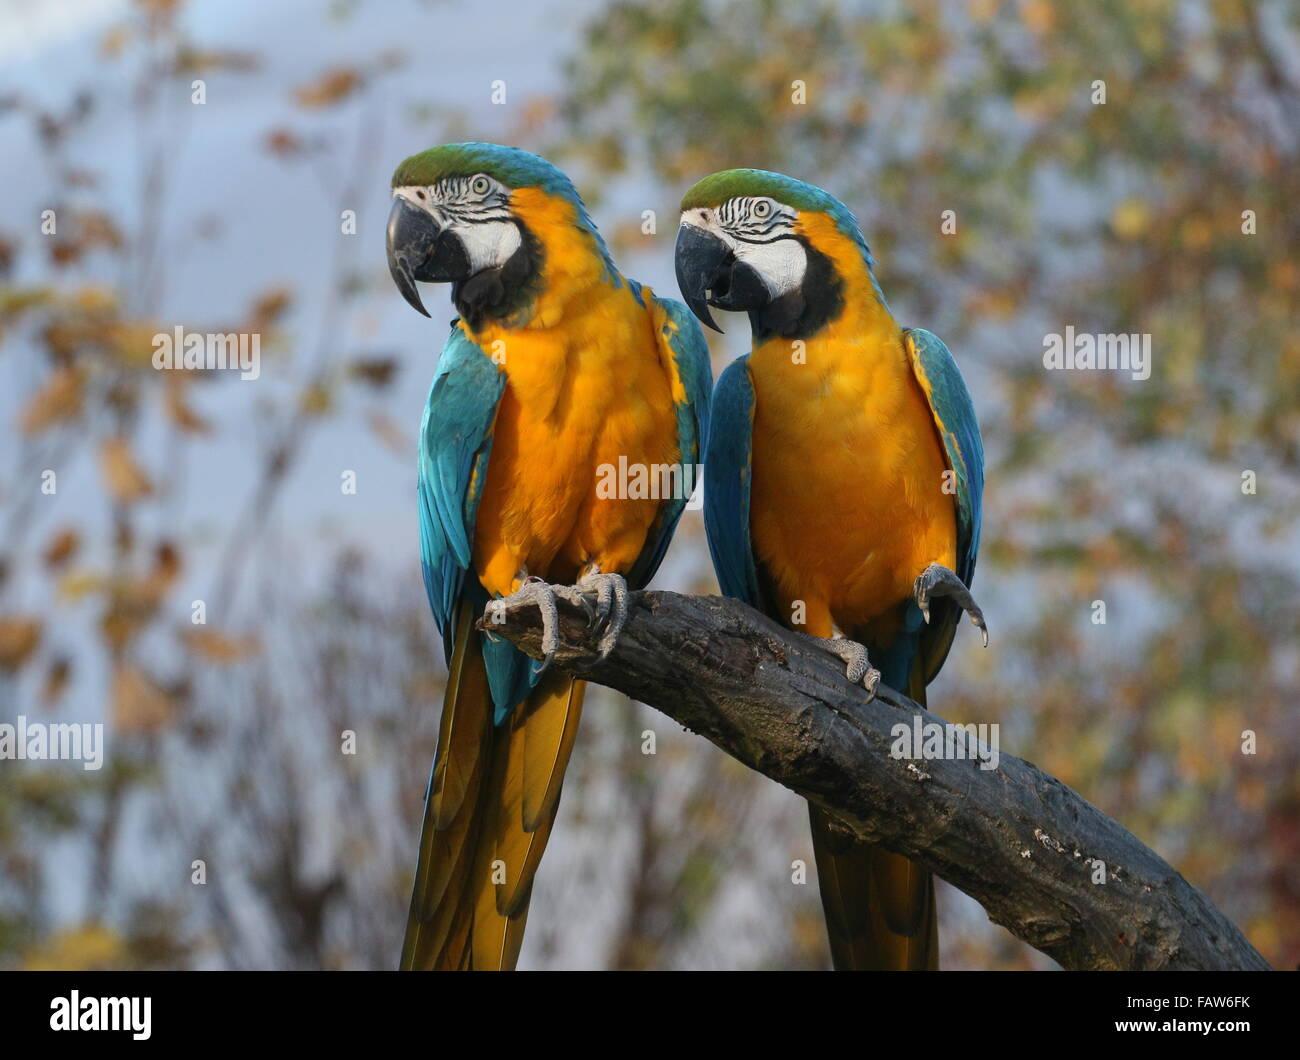 Pair of South American Blue and yellow macaws (Ara ararauna) Stock Photo